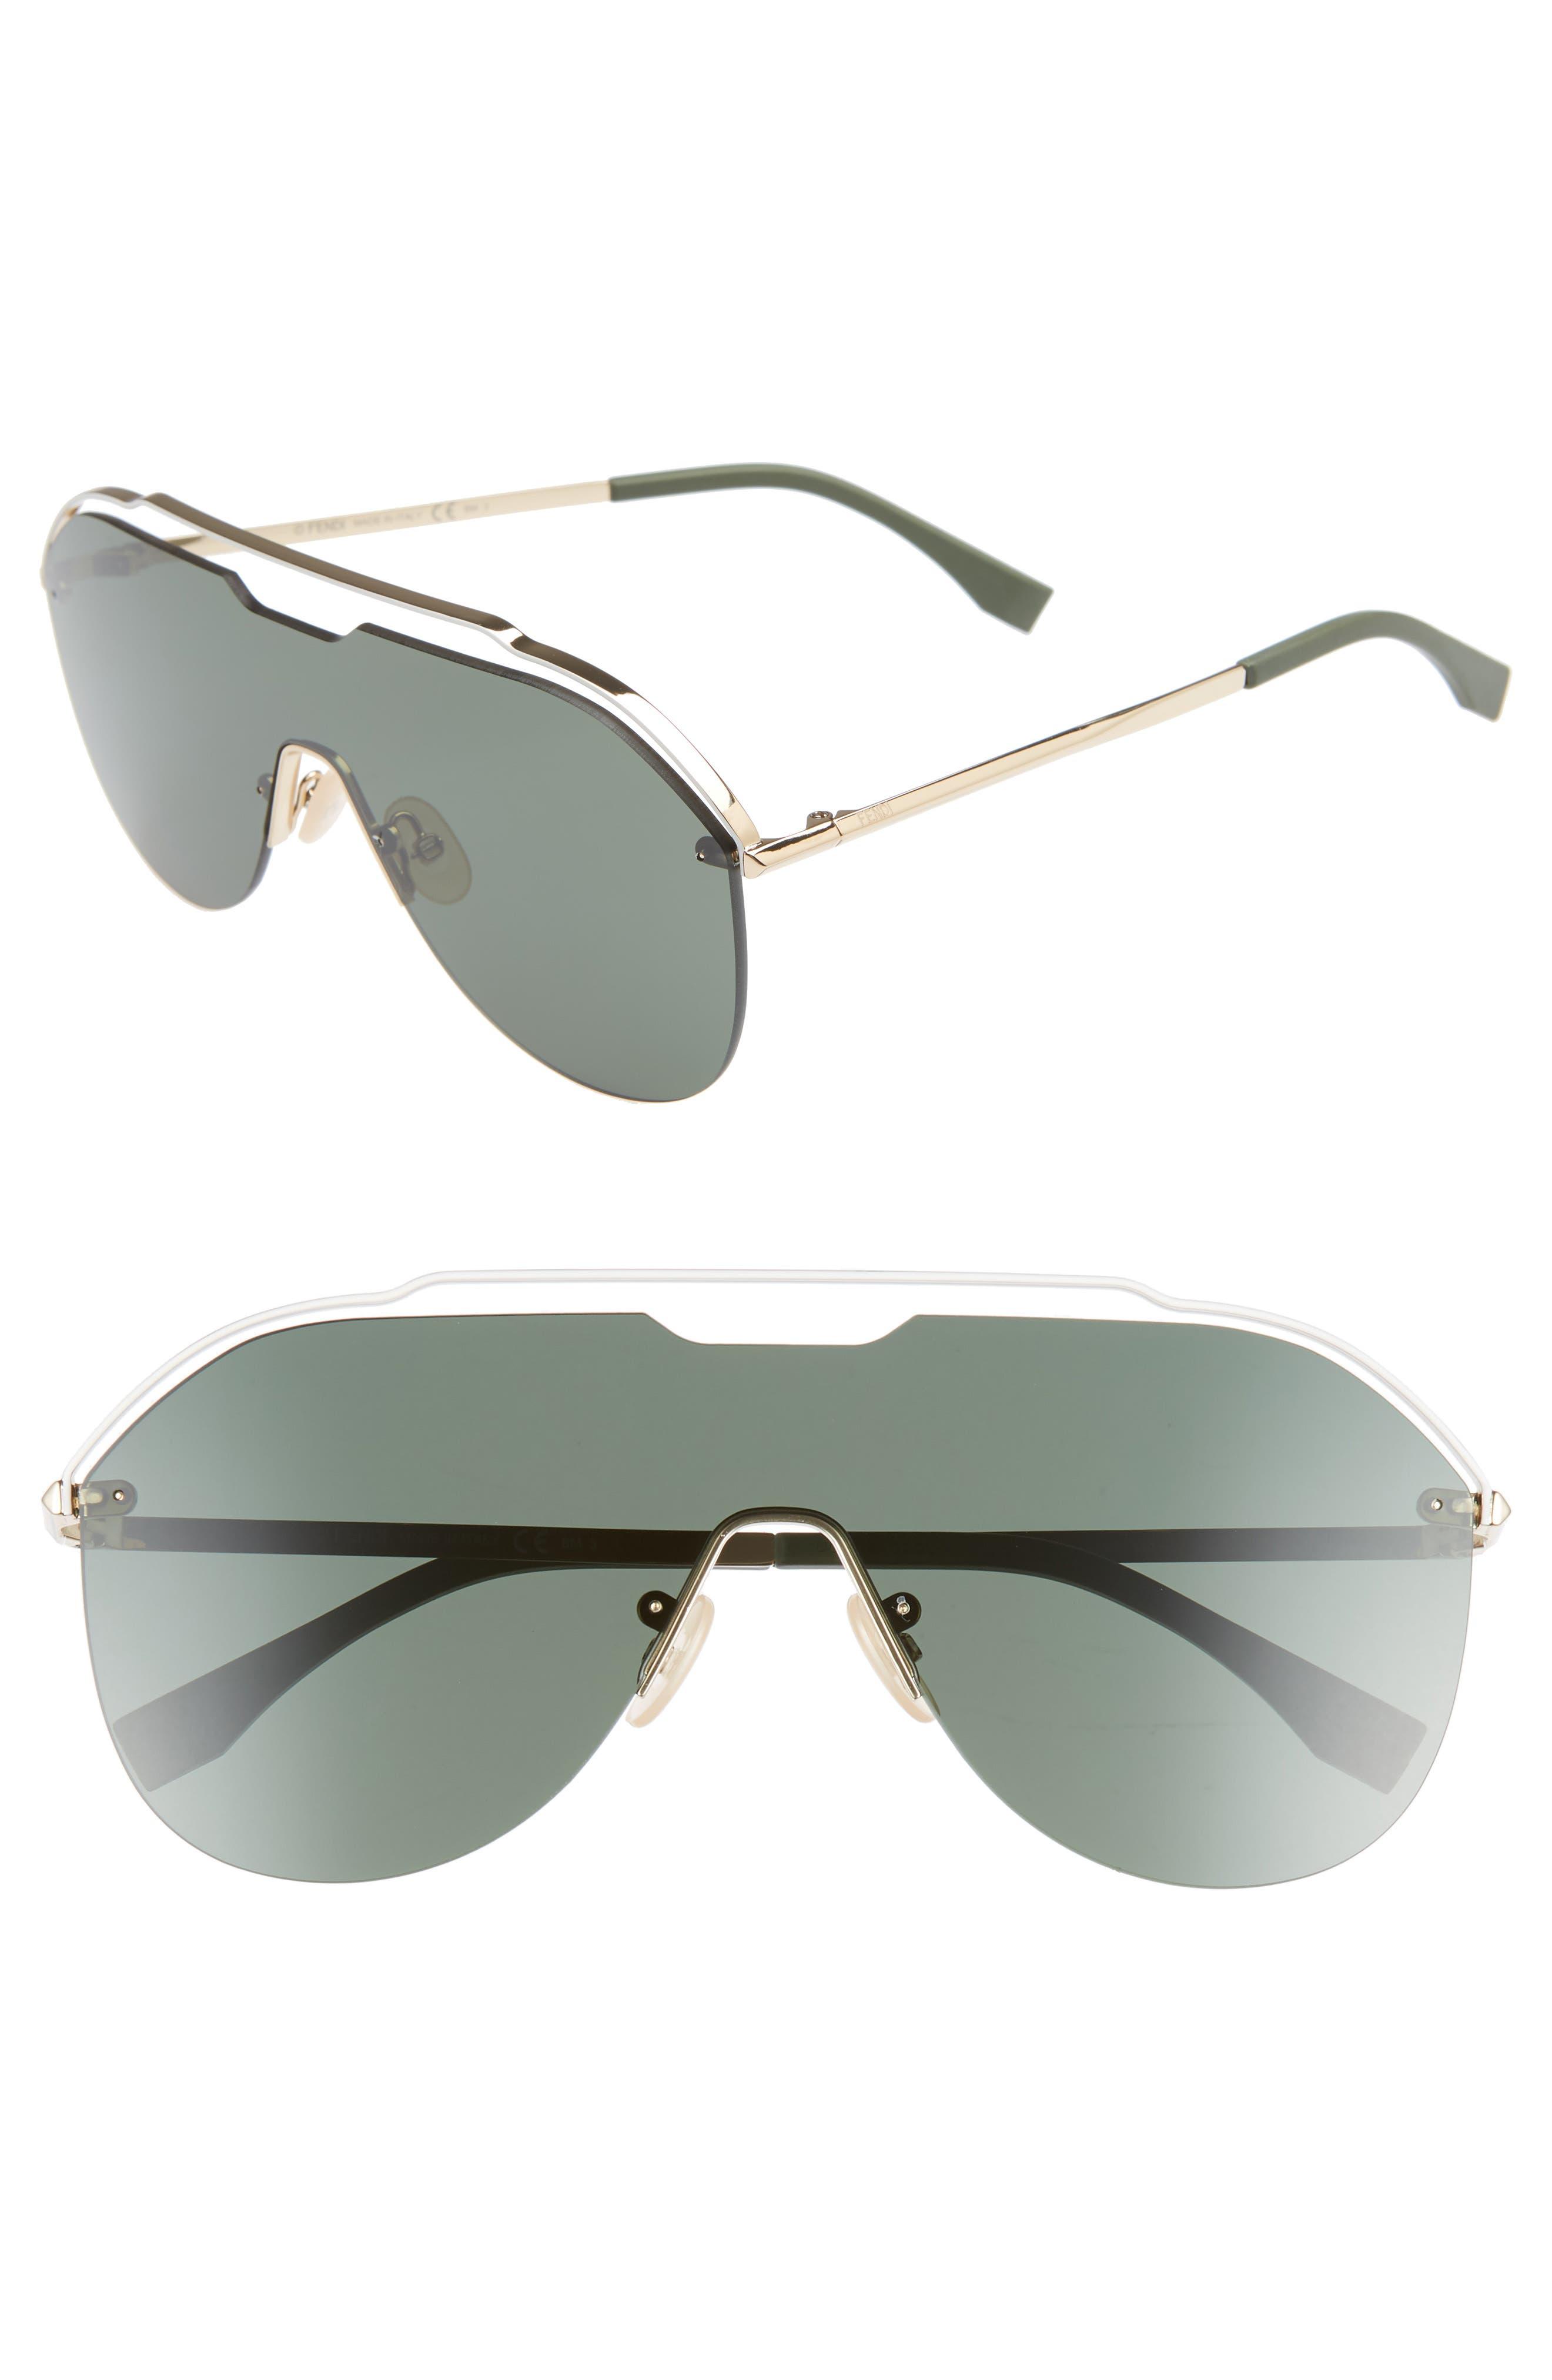 137mm Shield Aviator Sunglasses,                         Main,                         color, GOLD